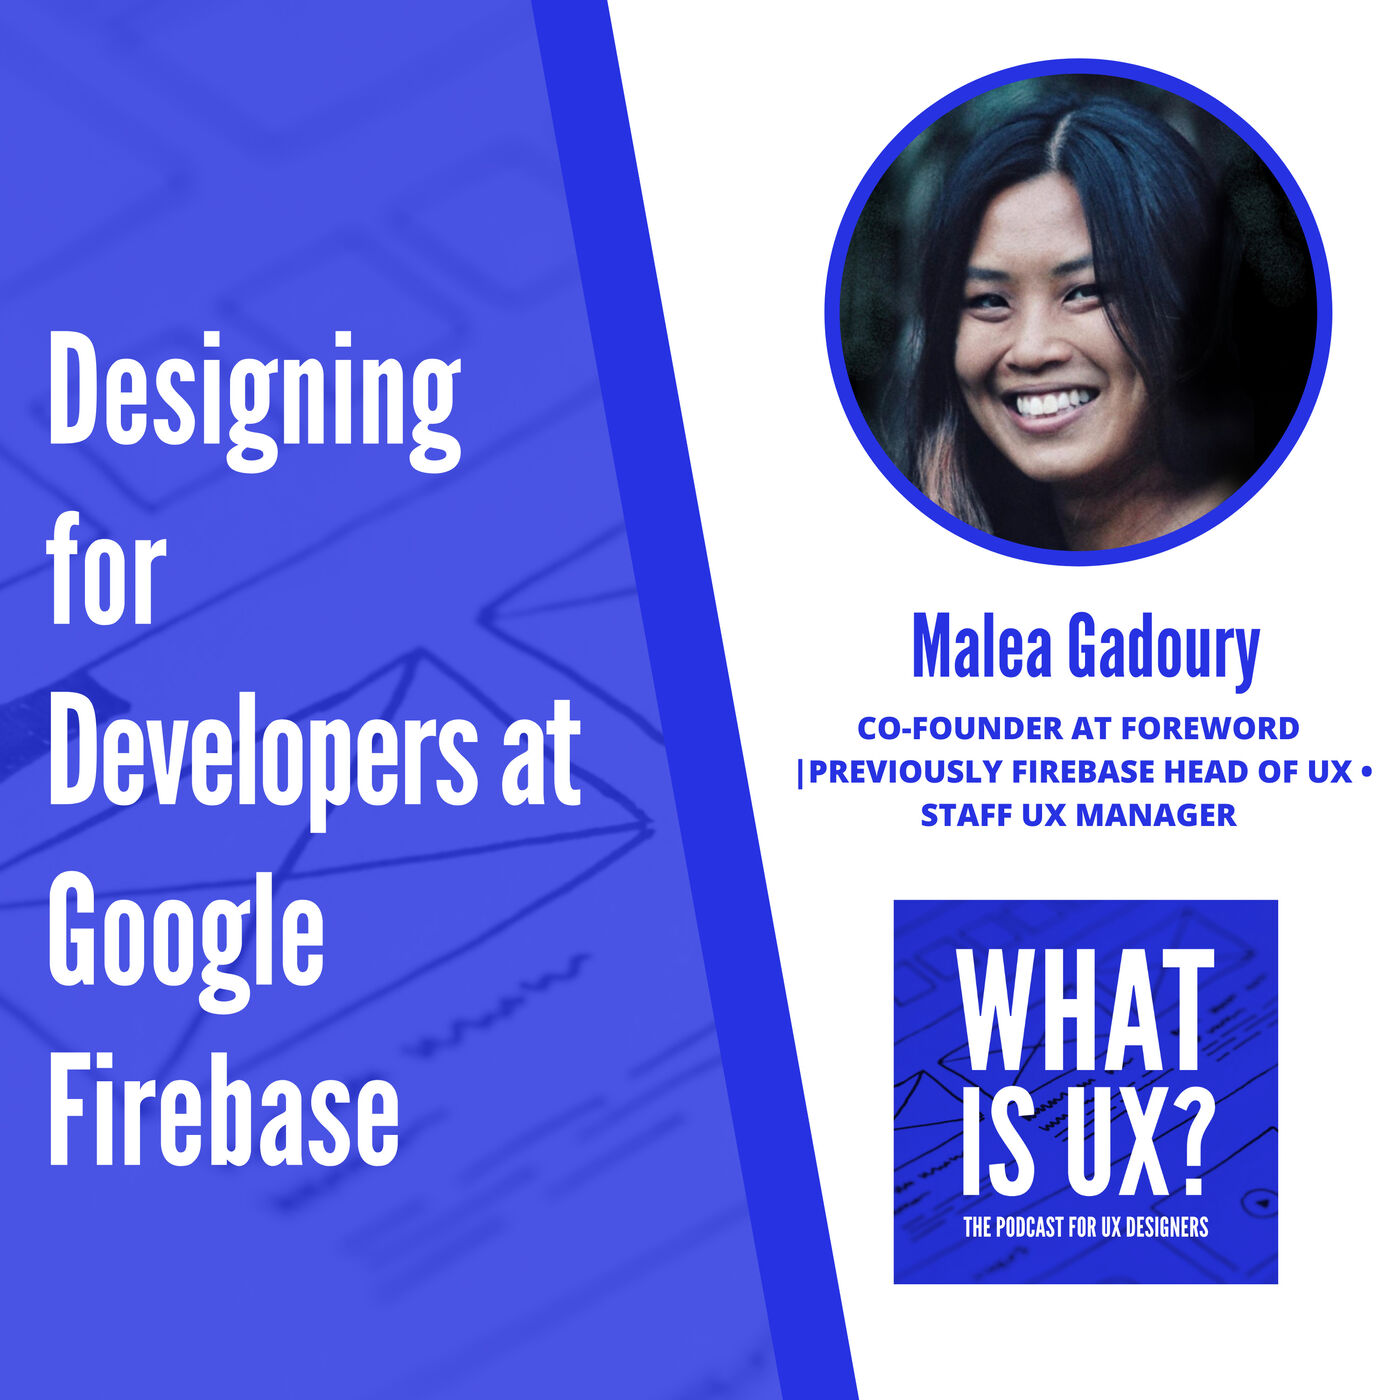 S1E5 Malea Gadoury: Designing for Developers at Google Firebase